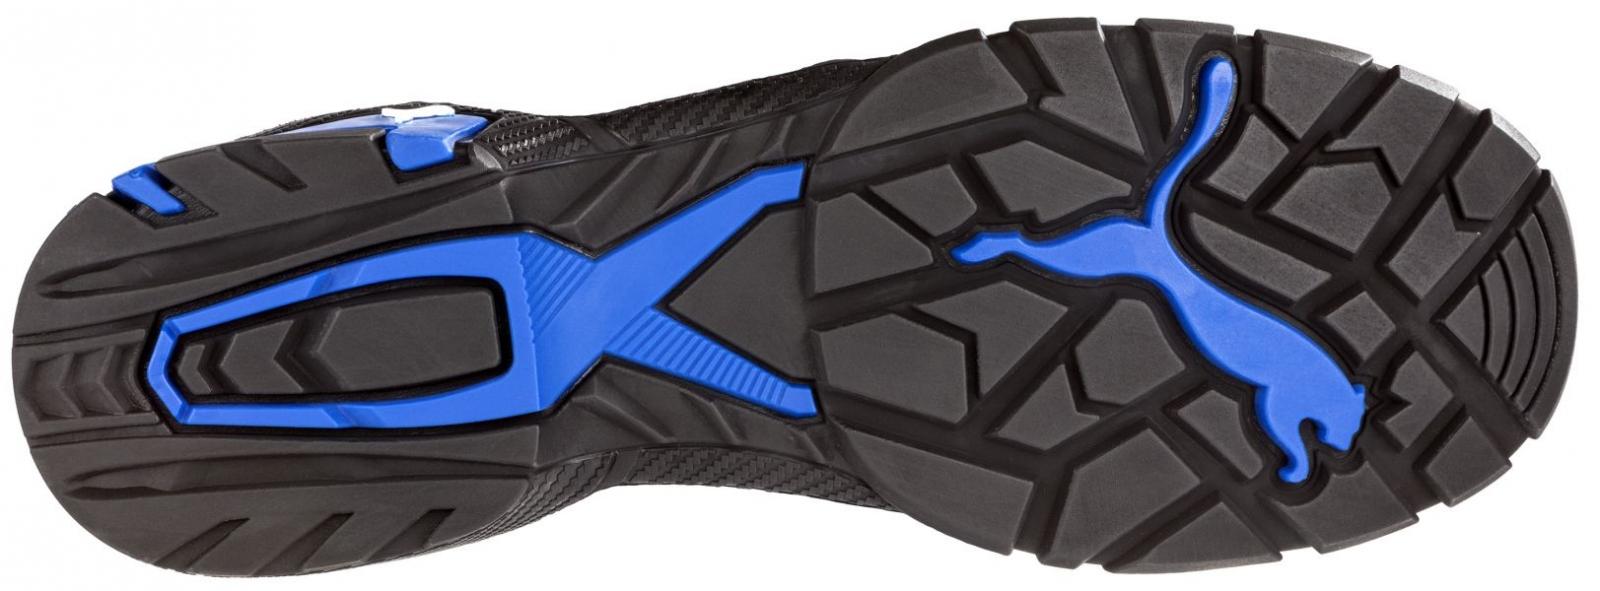 efe403364fd Puma 642750 RIO BLACK LOW Metro Protect Safety shoes S3 SRC - online ...